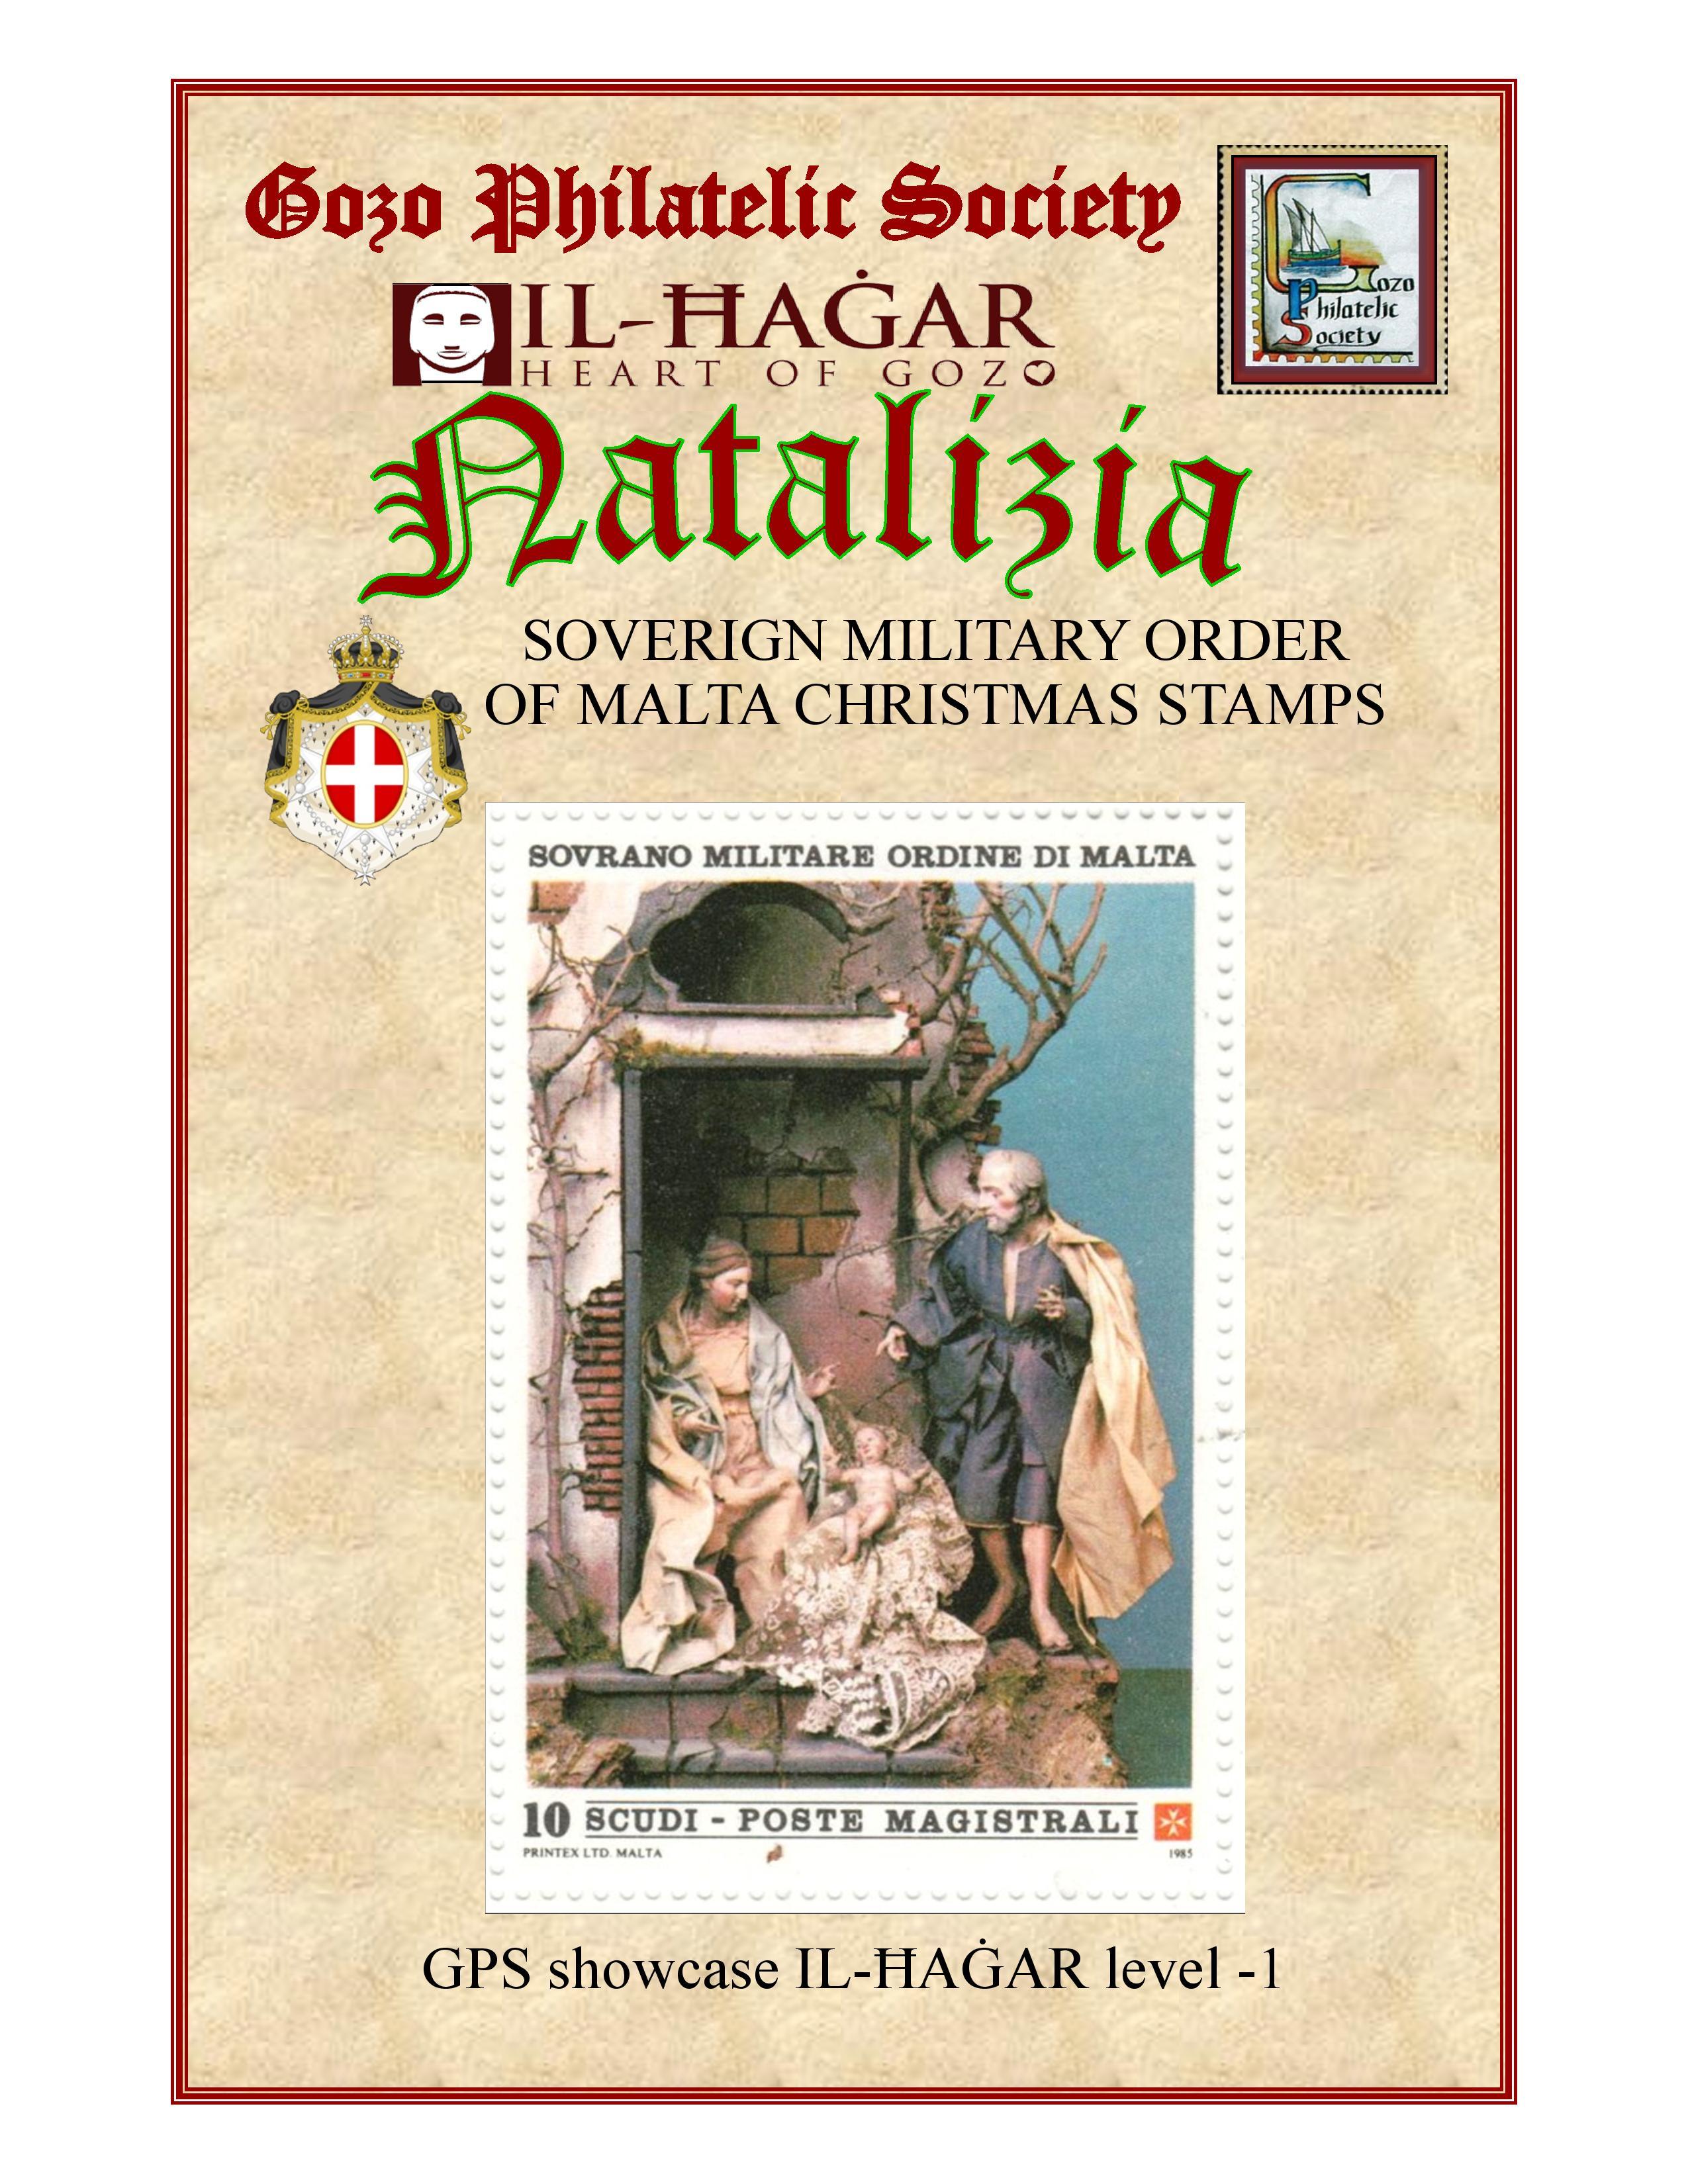 SMOM Christmas stamps at Il-Ħaġar